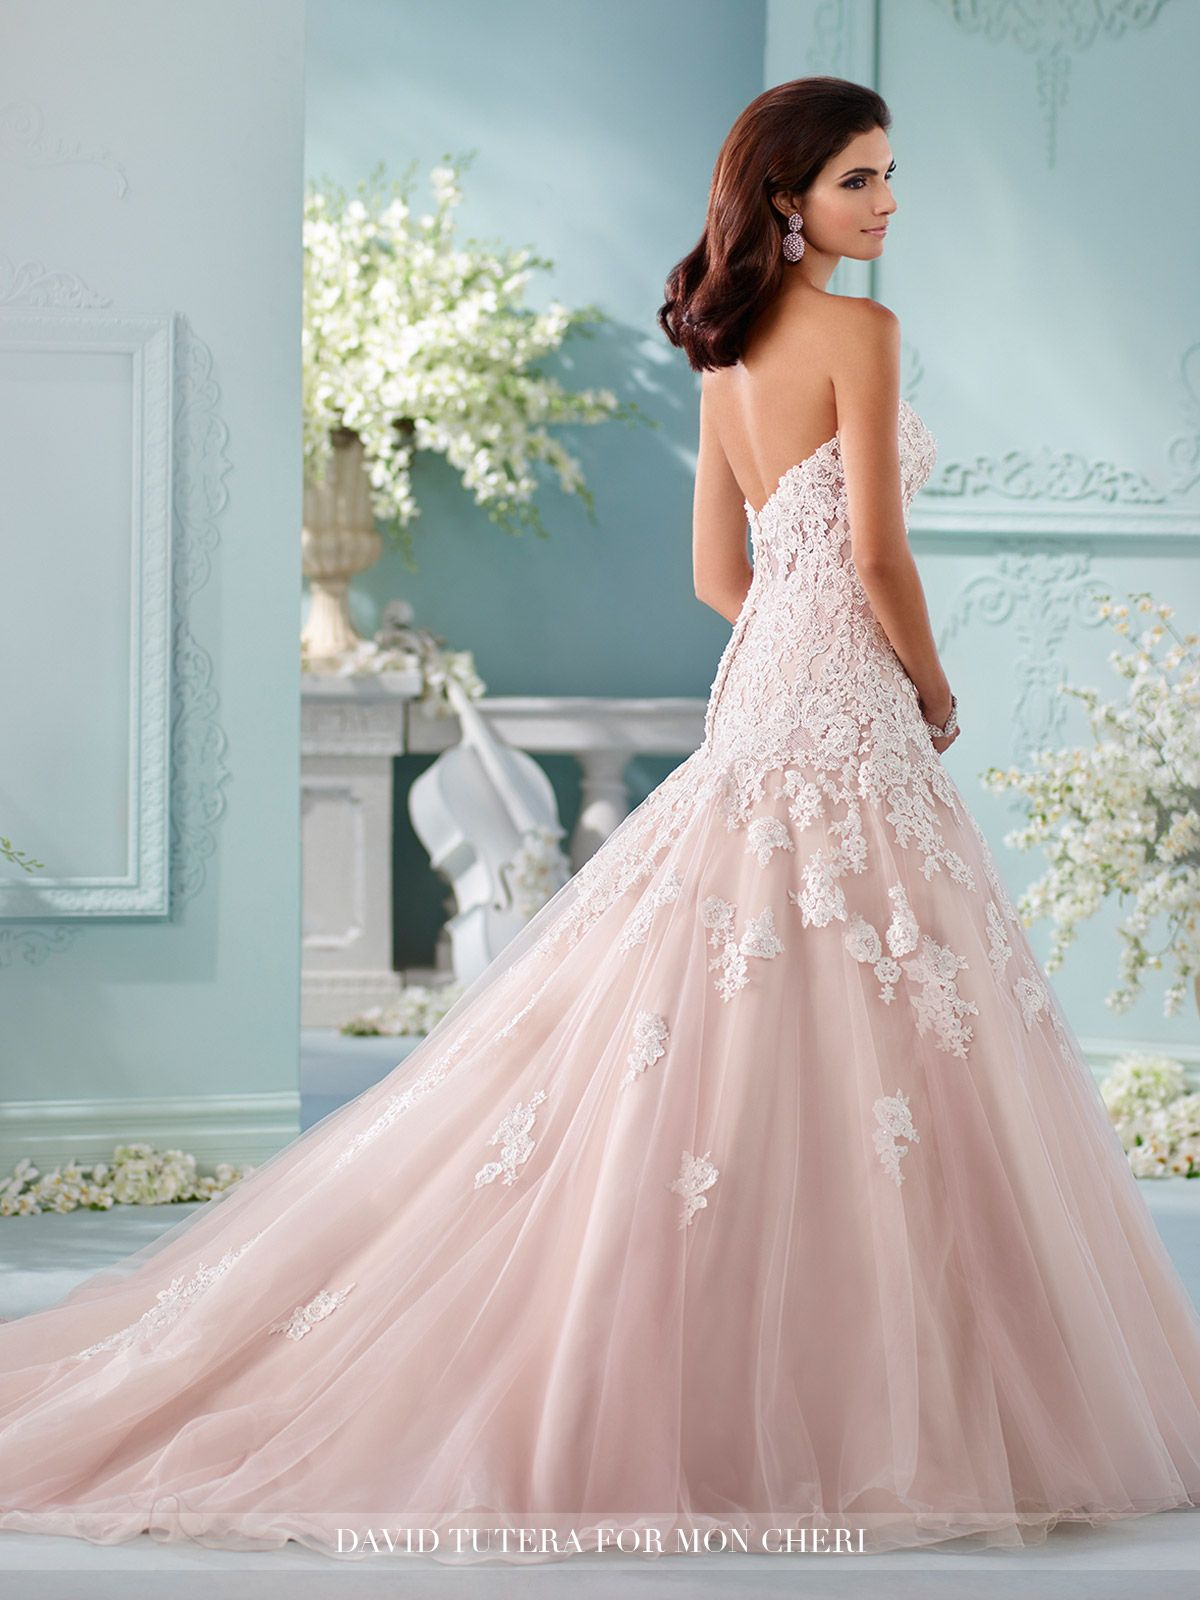 Strapless Dropped-Waist Lace A-Line Wedding Dress- 216241 Kalapini ...